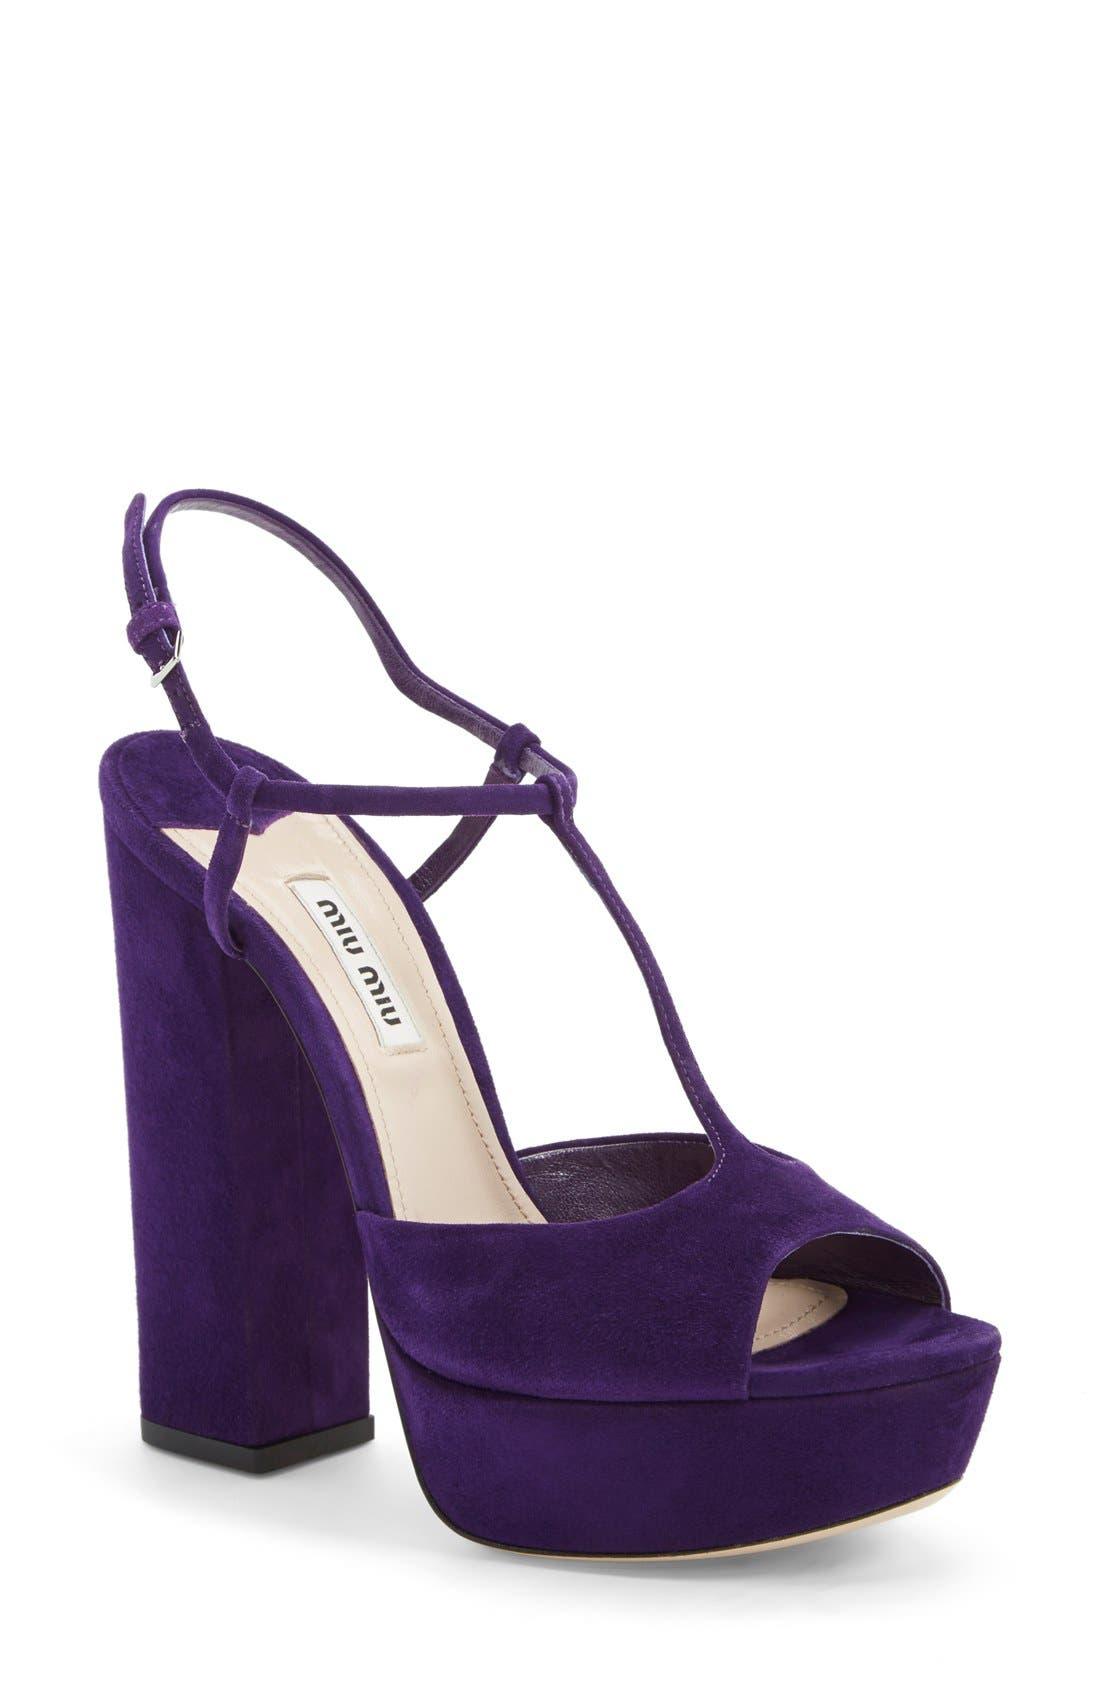 Alternate Image 1 Selected - Miu Miu Mary Jane Platform Sandal (Women)